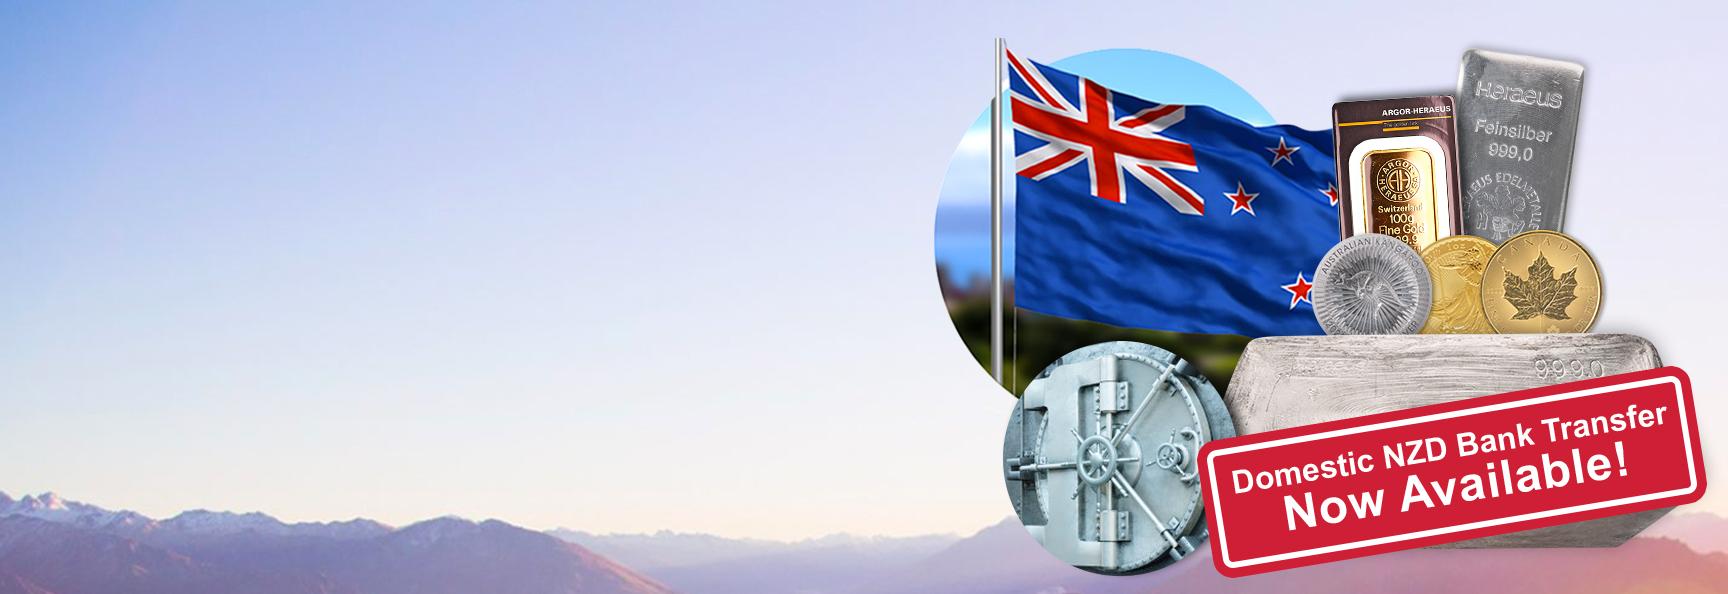 Buy & Store Bullion in New Zealand with BullionStar